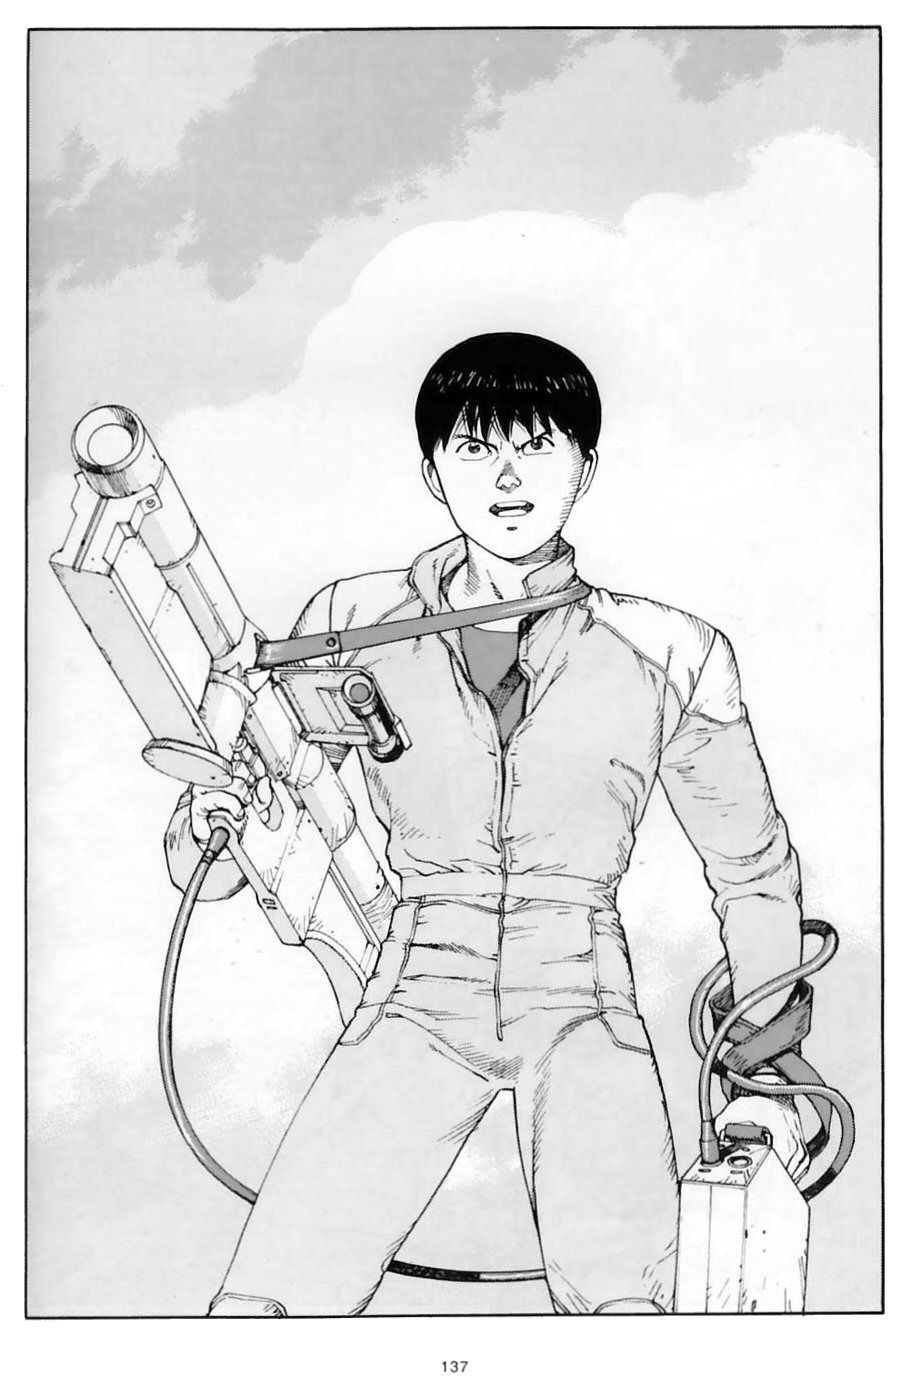 Kaneda And The Laser Cannon Akira Manga Akira Anime Akira Kaneda